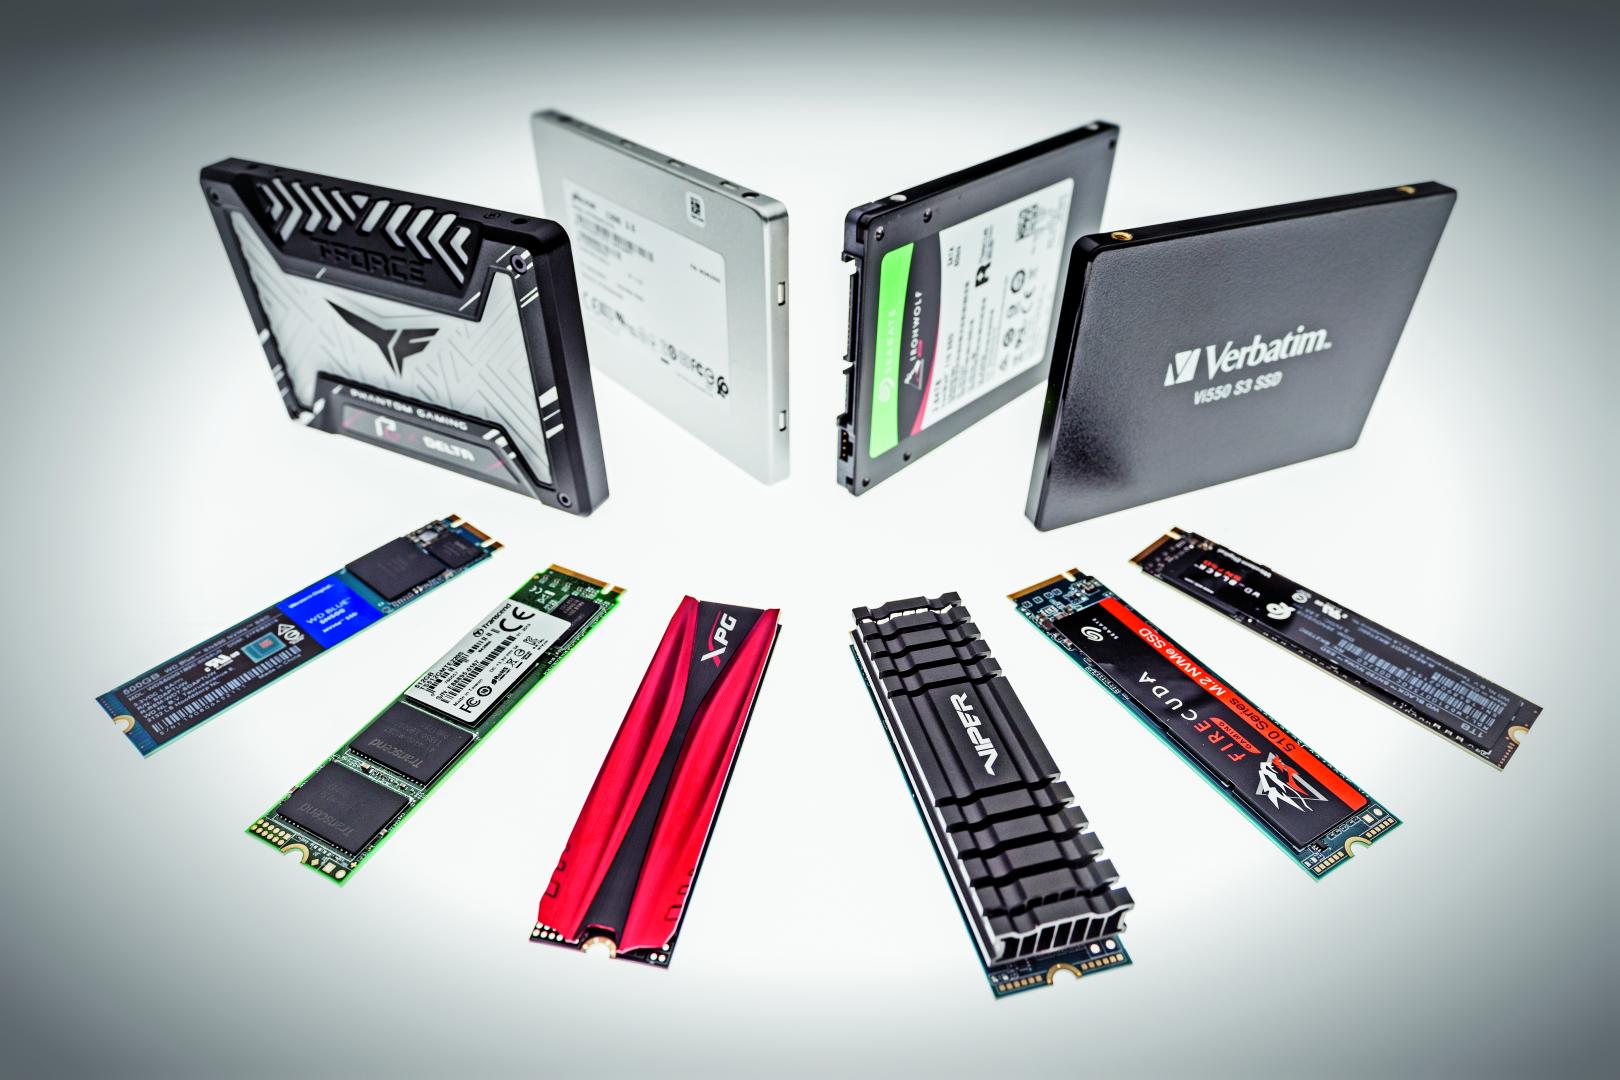 snelle ssd test SATA PCIe interface vergelijking energieverbruik